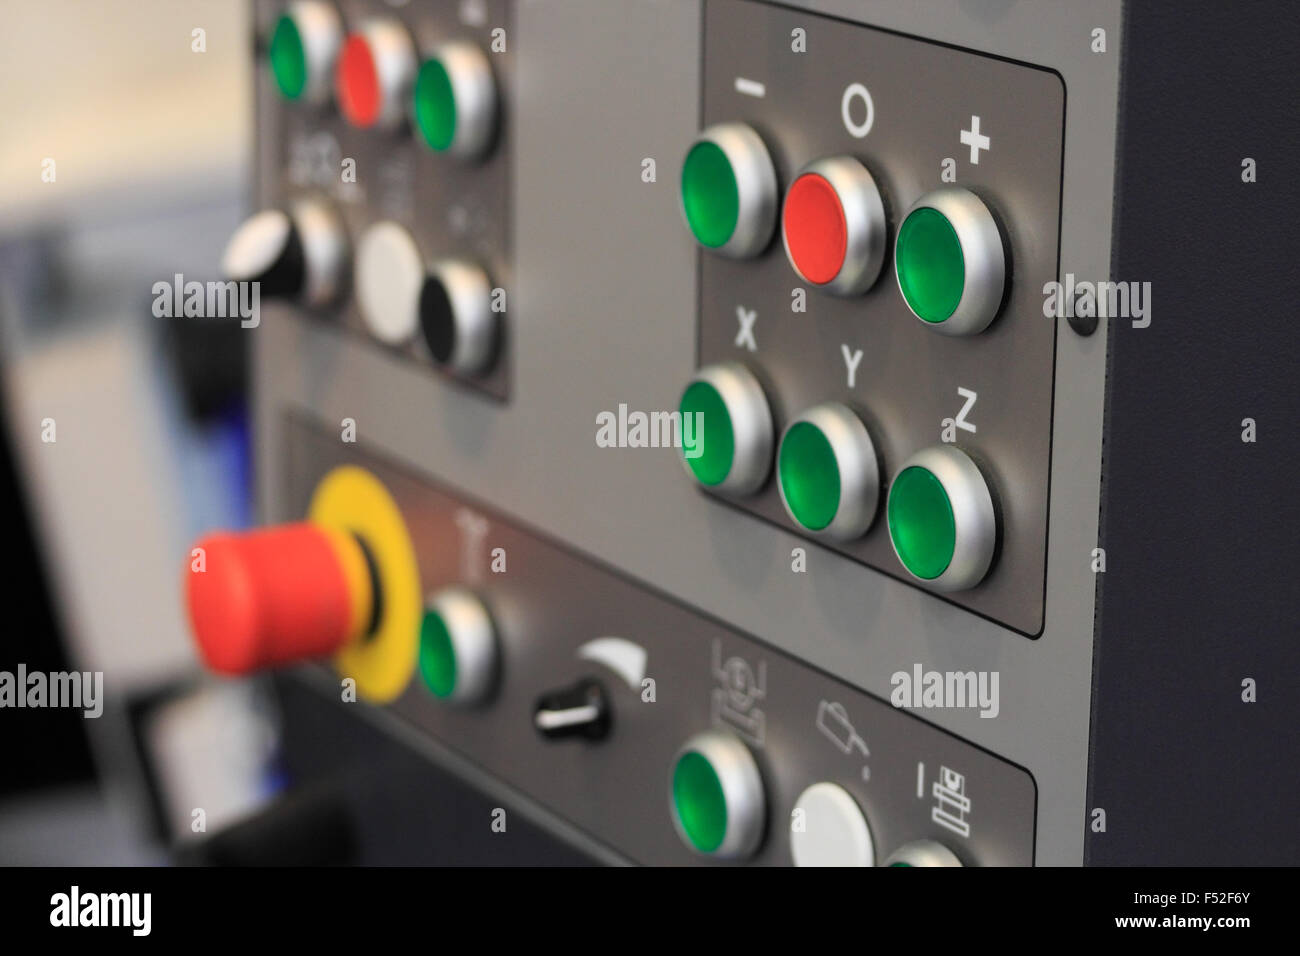 Control panel of CNC machining center. Closeup view. - Stock Image